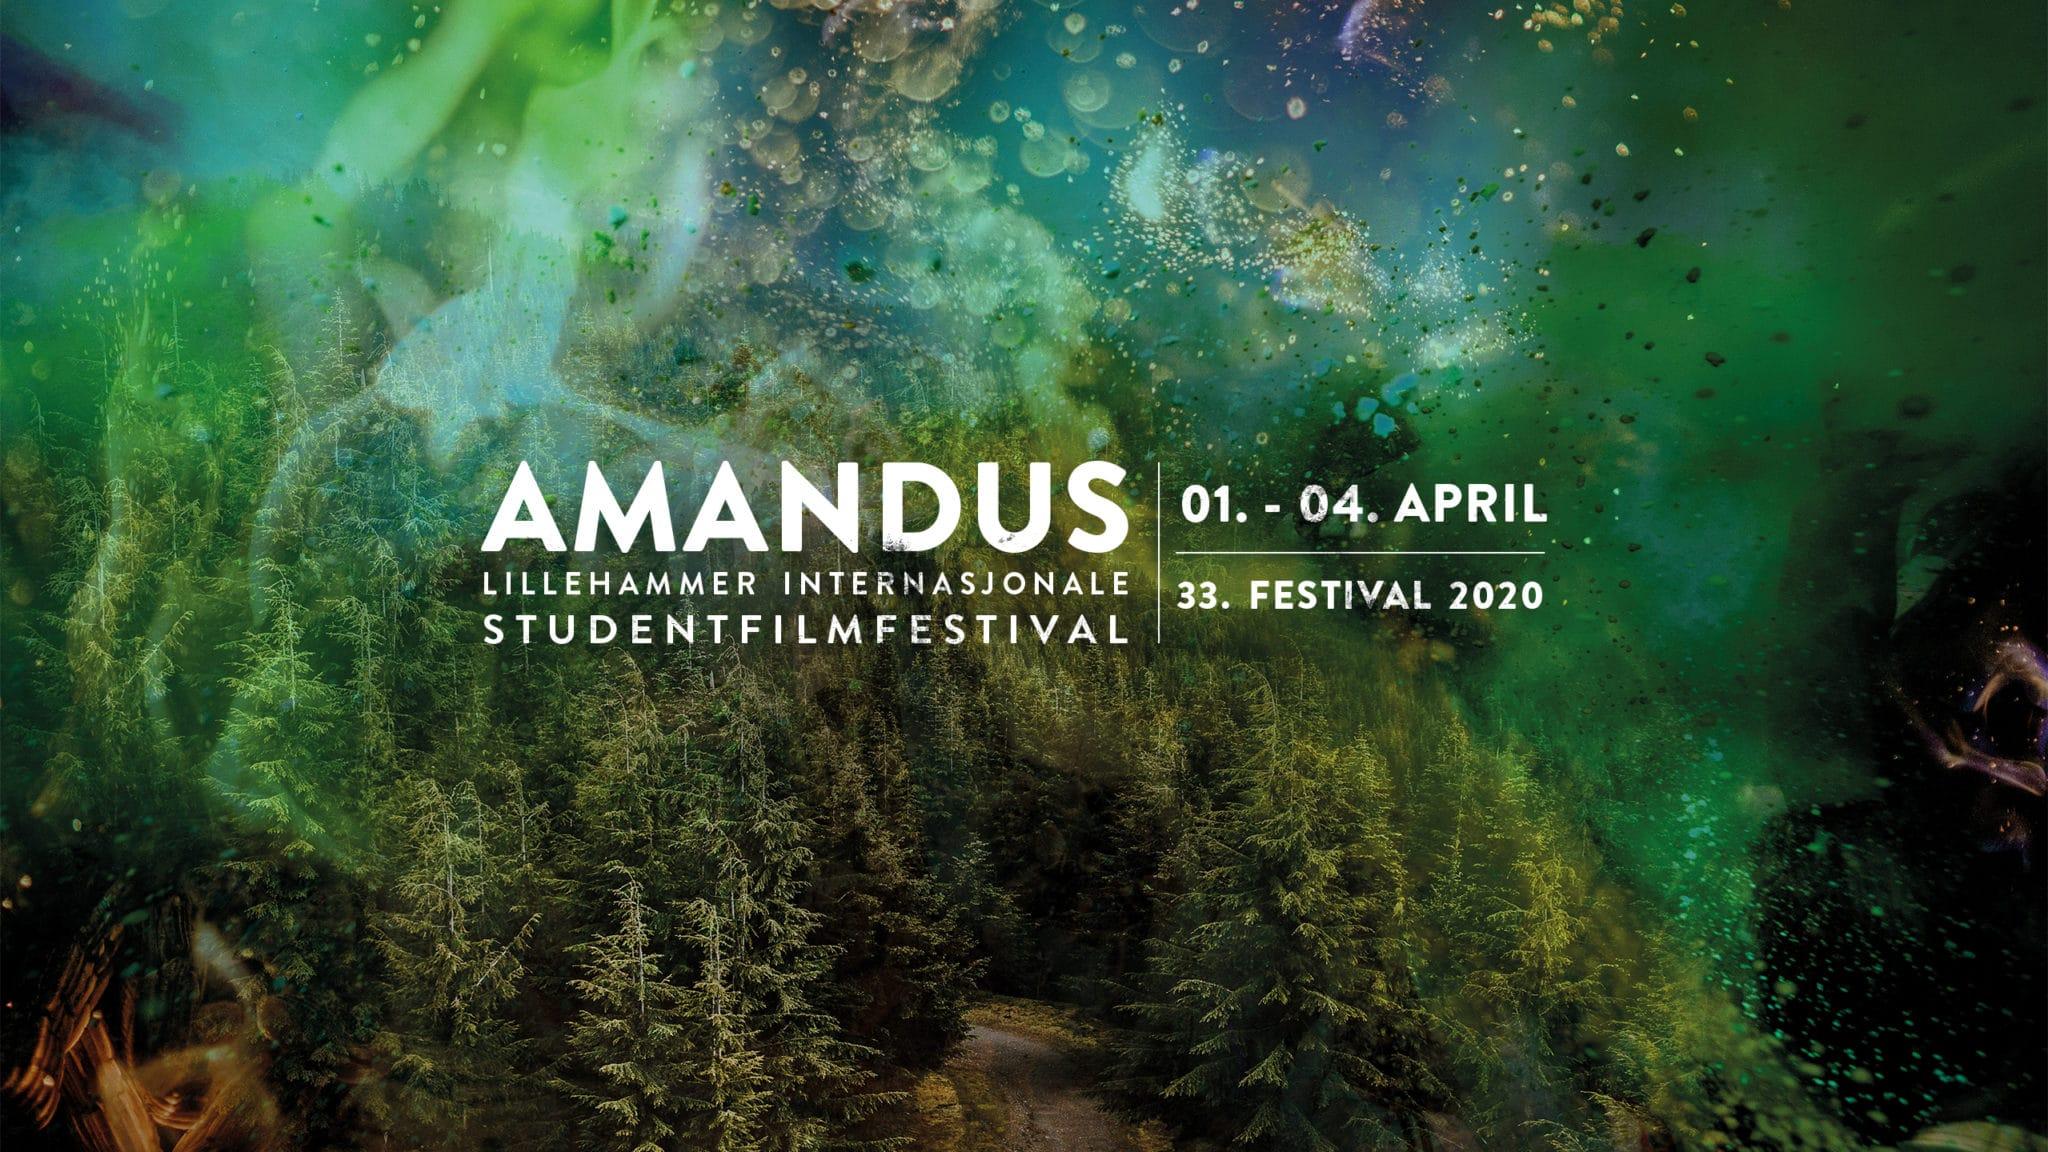 Amnadusfestivalens plakat